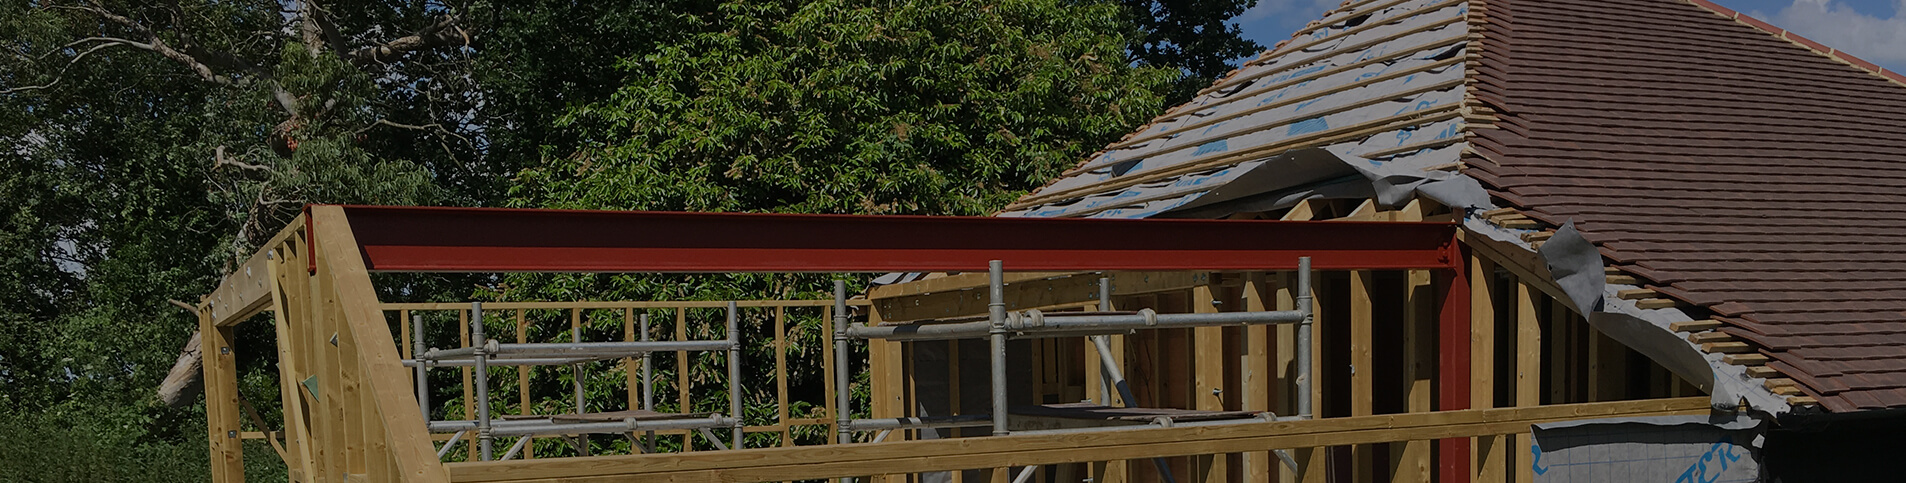 Extensions & Loft conversions Essex